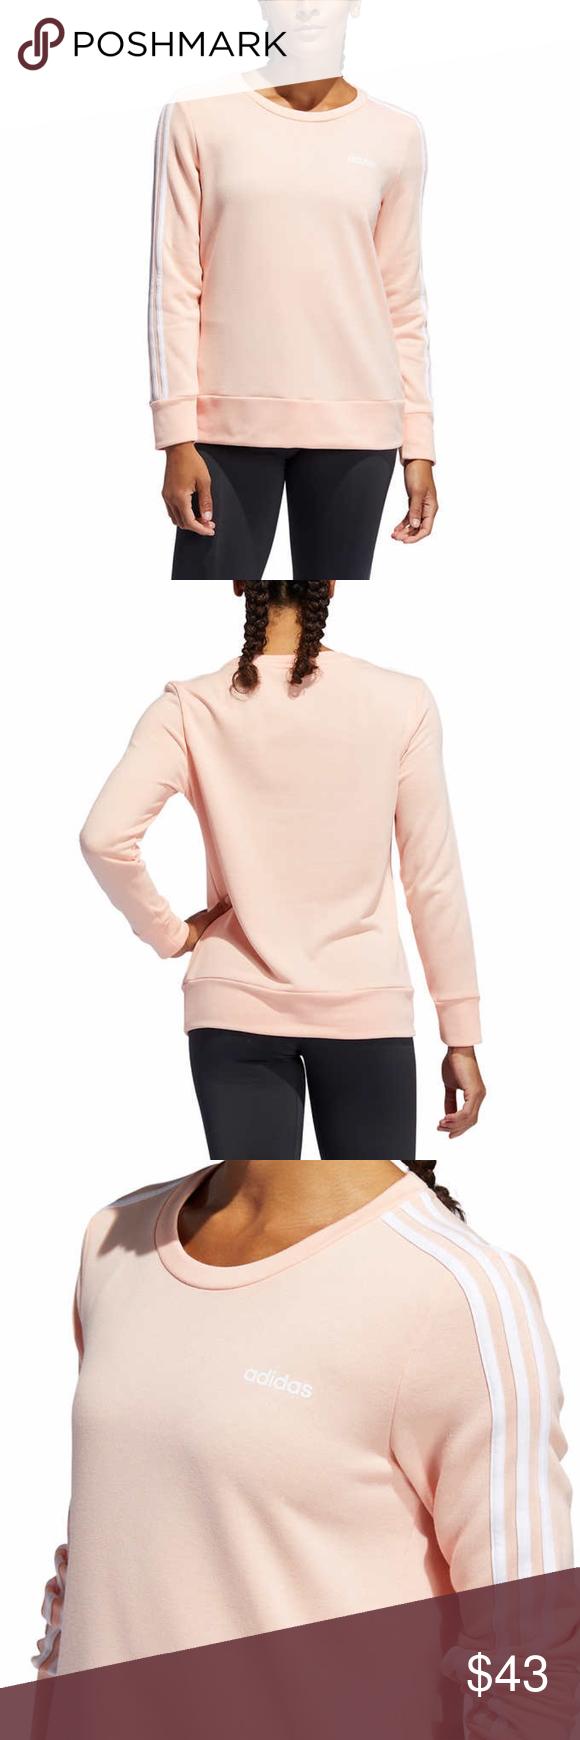 Adidas Women S Crewneck Sweatshirt Pink Womens Crewneck Adidas Women Crew Neck Sweatshirt [ 1740 x 580 Pixel ]